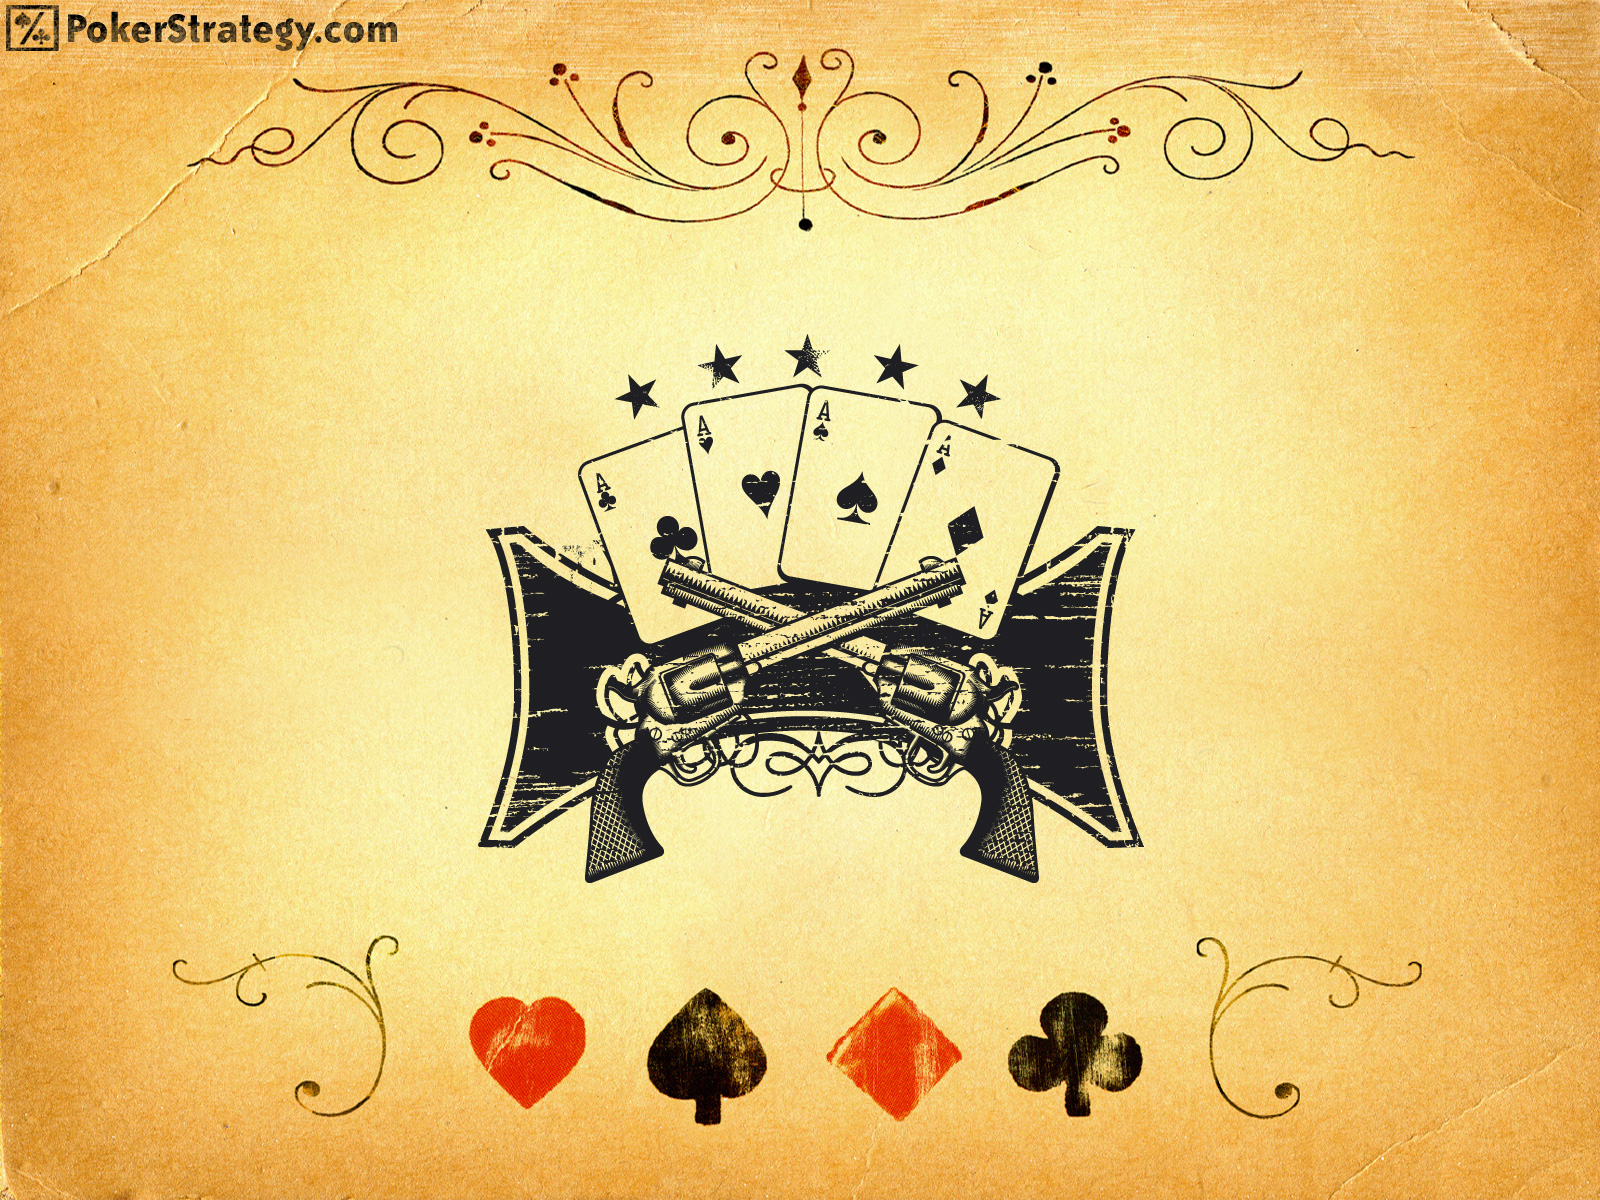 Western poker wallpapers Western poker stock photos 1600x1200